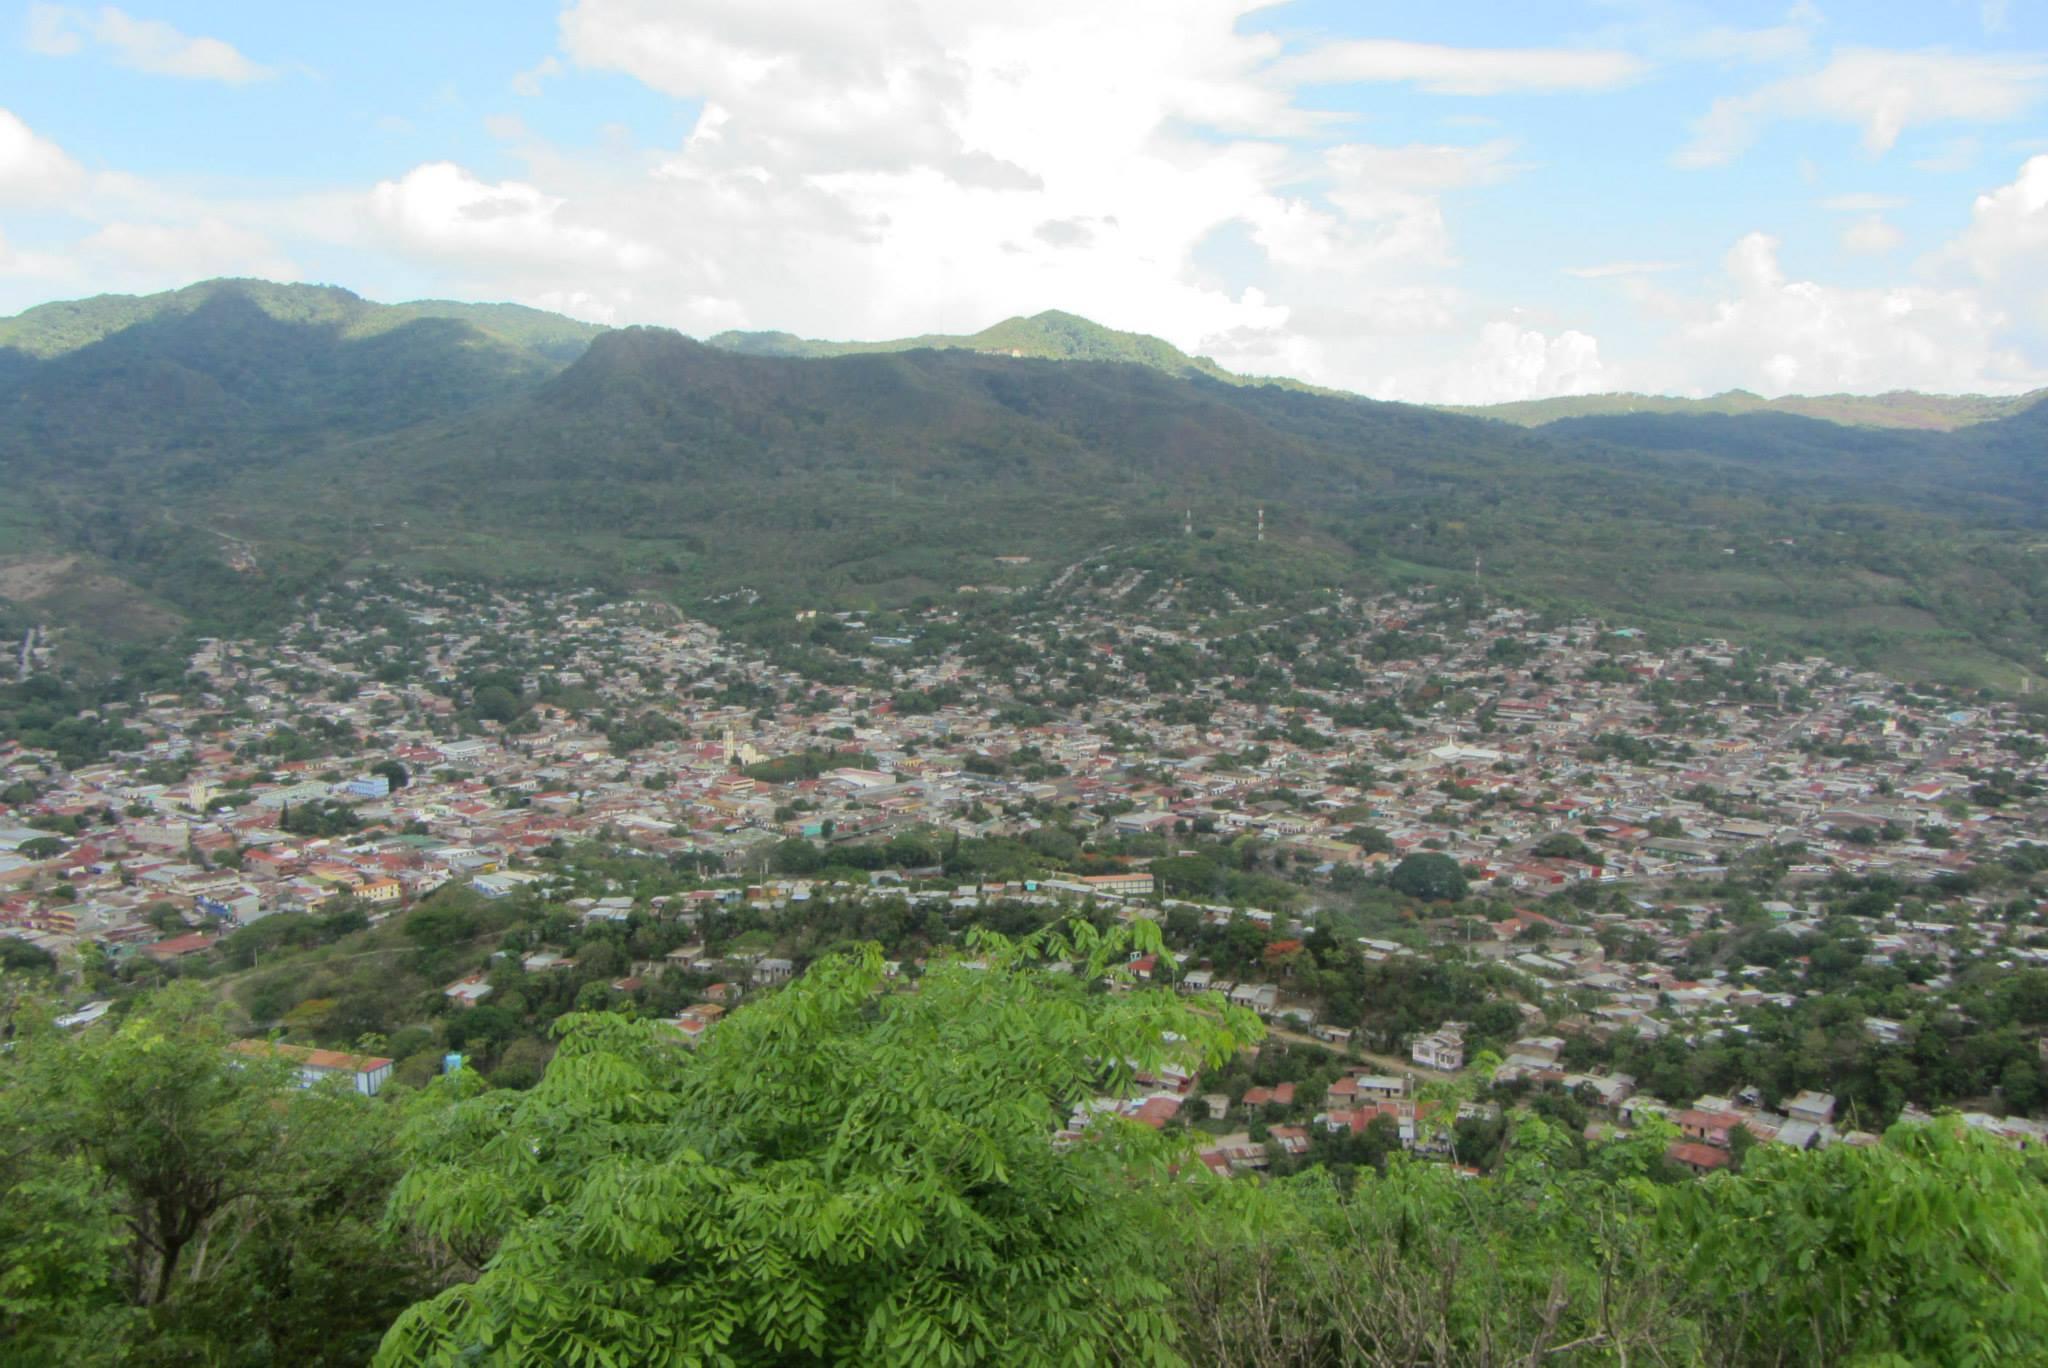 Matagalpa, Nicaragua. (Photo by author.)